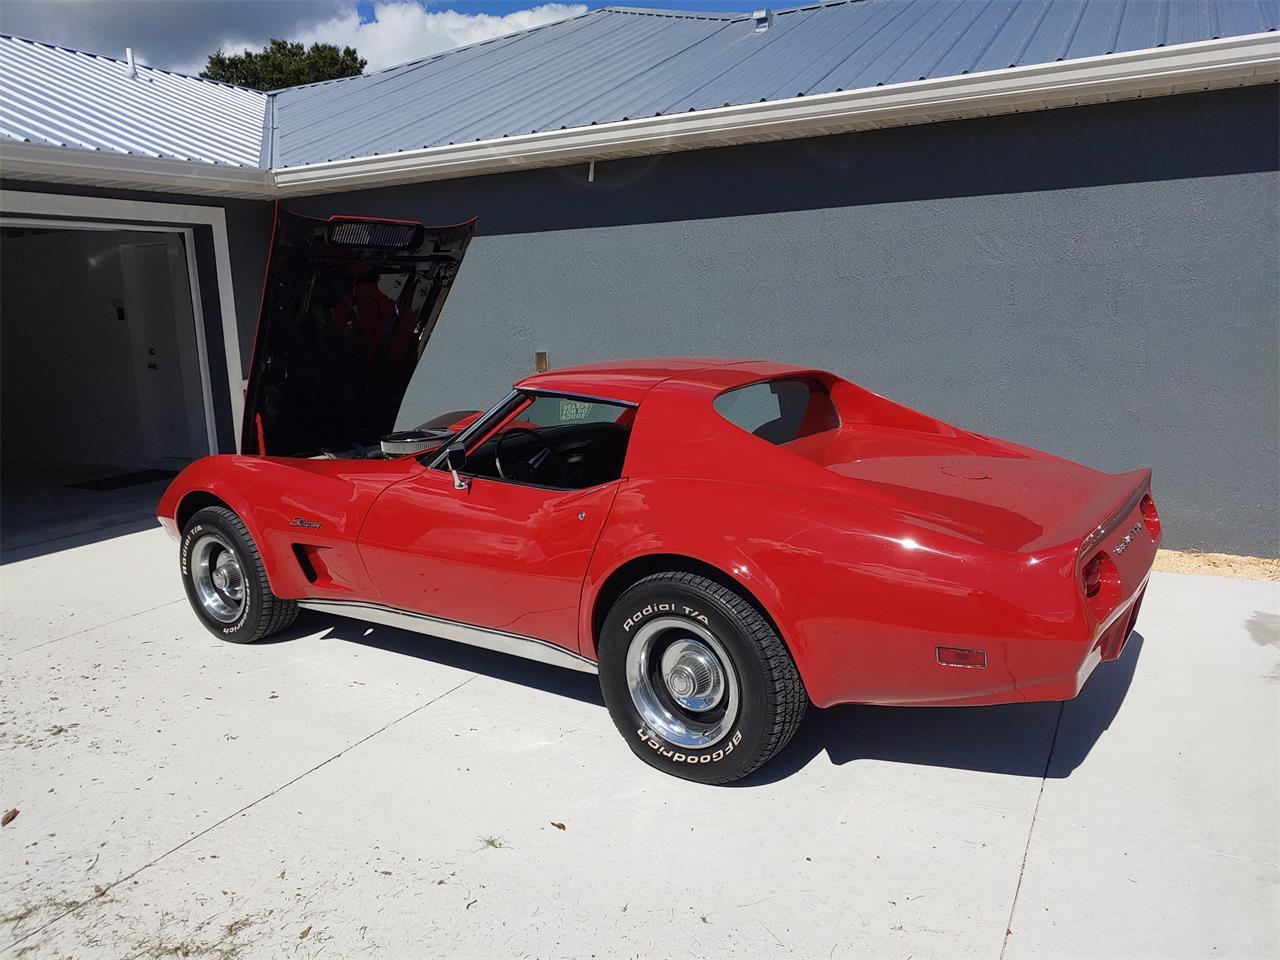 1974 Chevrolet Corvette (CC-1418692) for sale in Auburndale, Florida